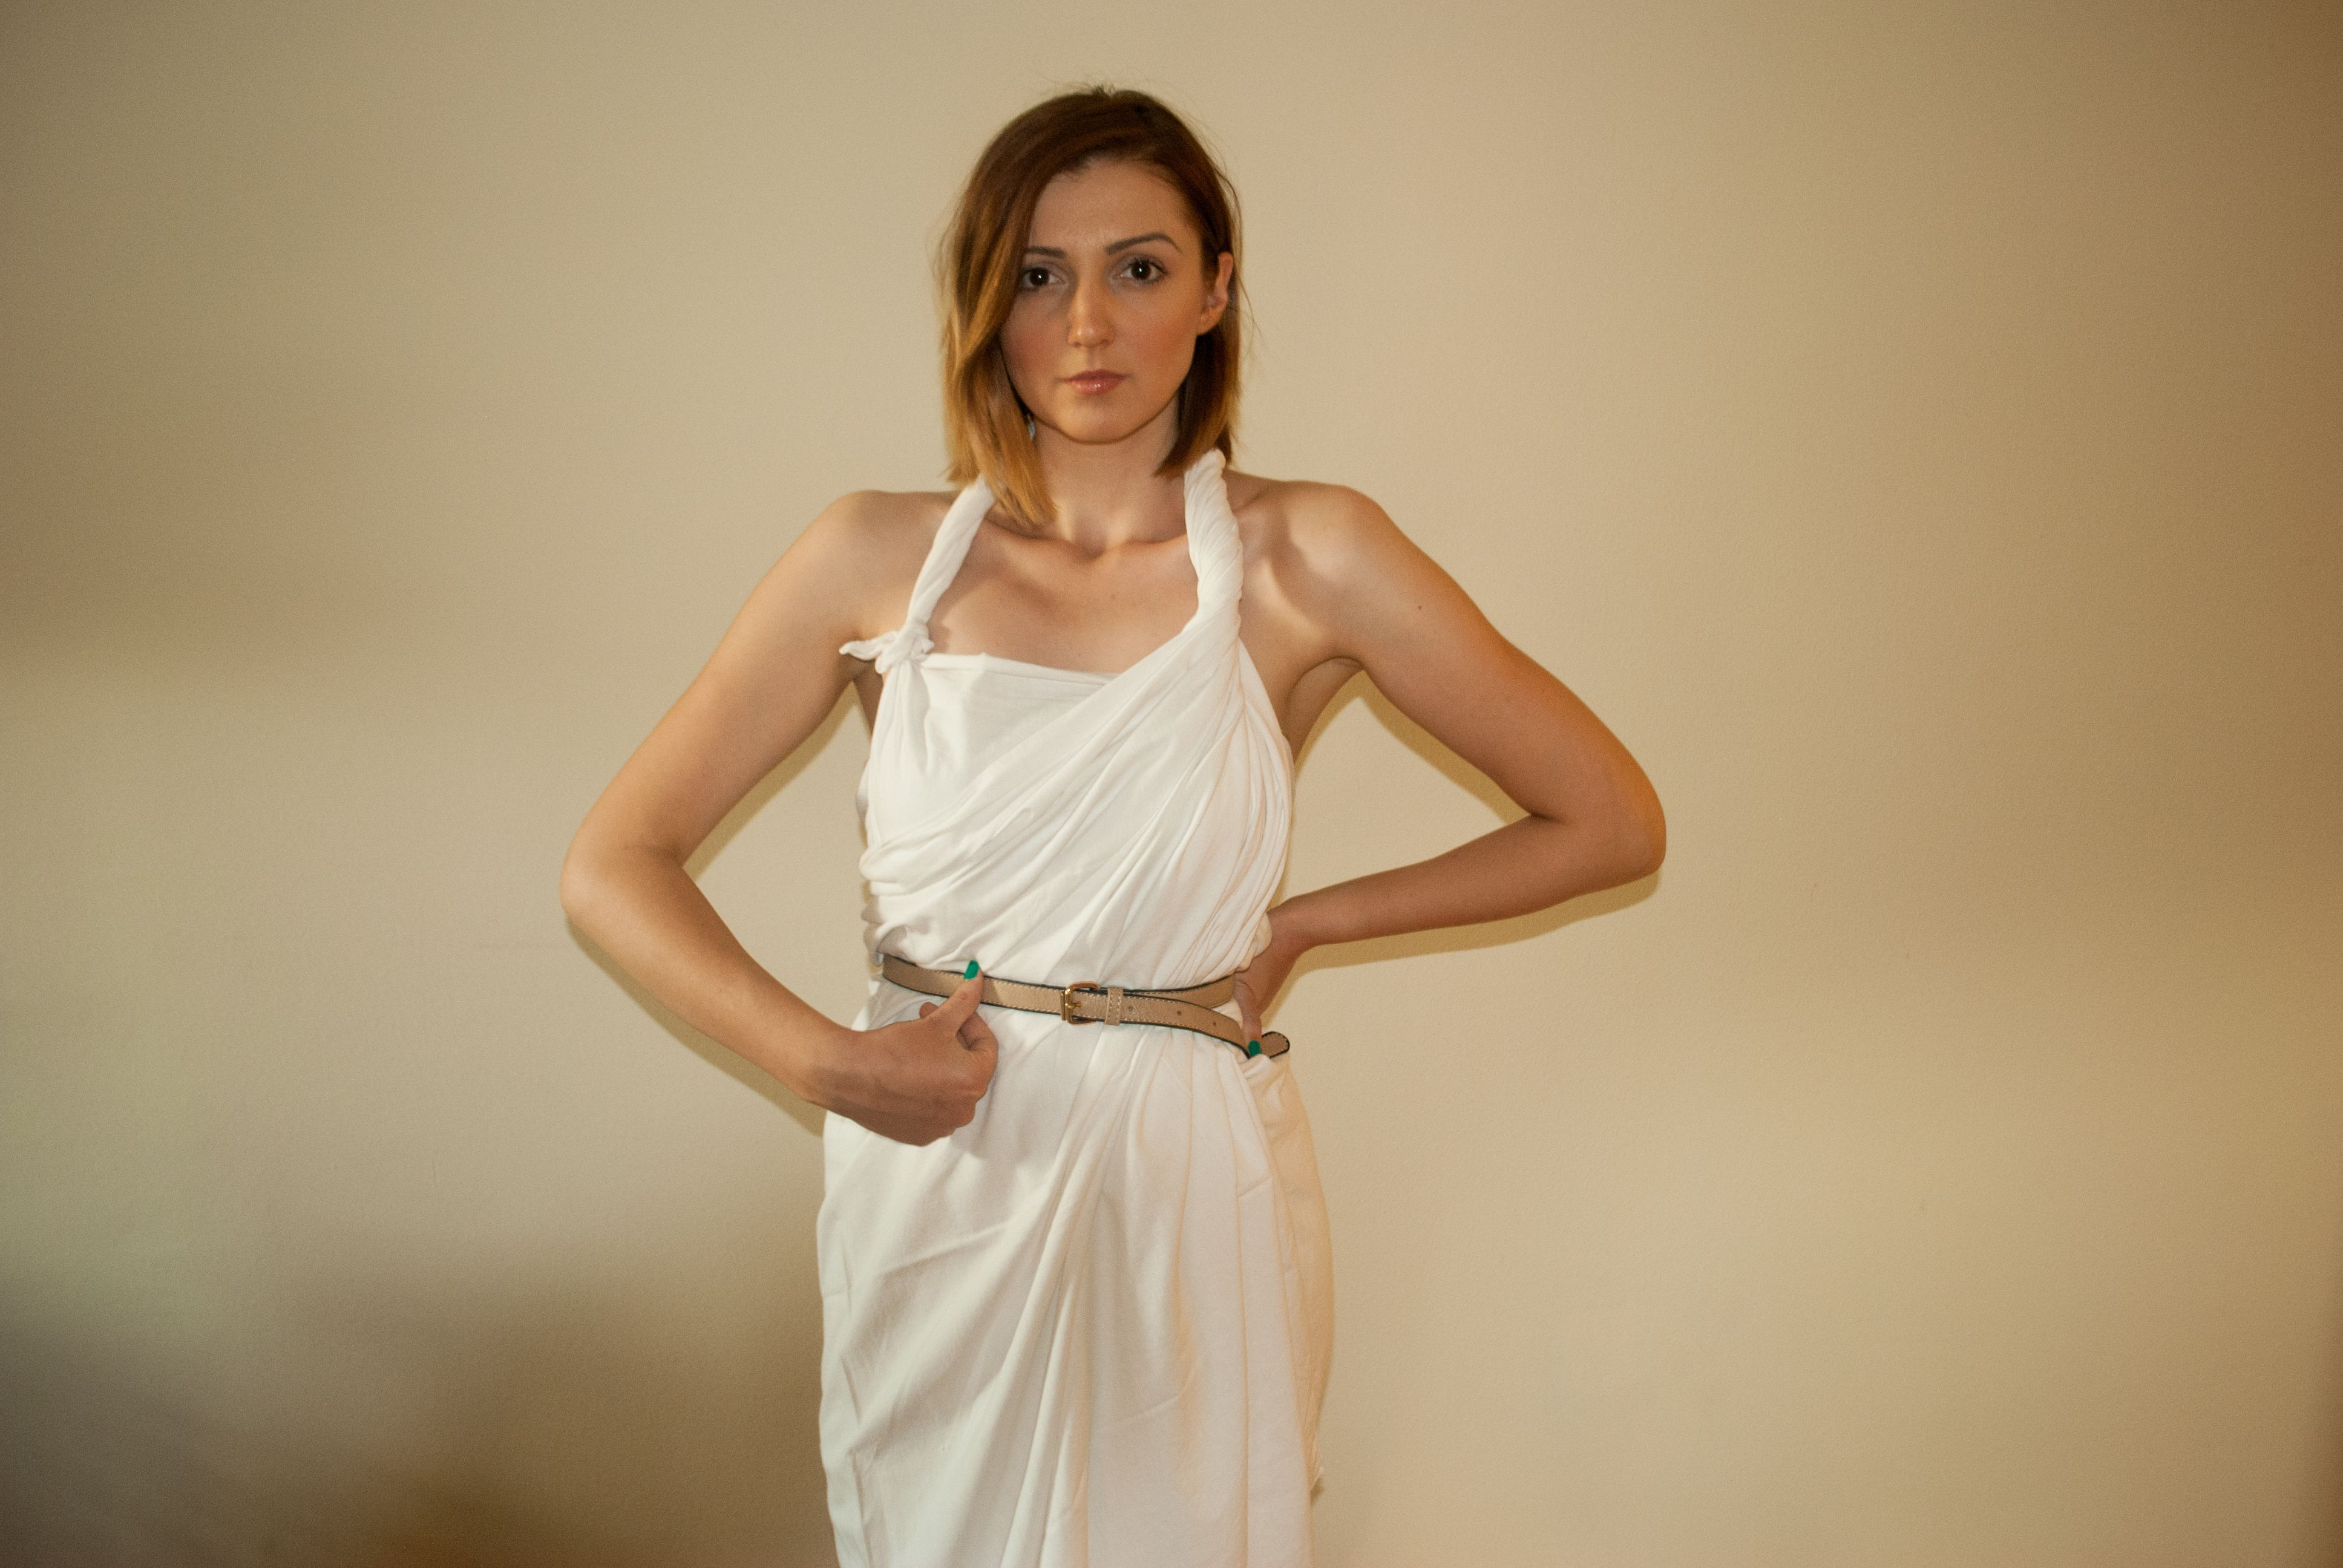 How To Make A Female Toga Toga Costume Diy Toga Outfits Greek Toga